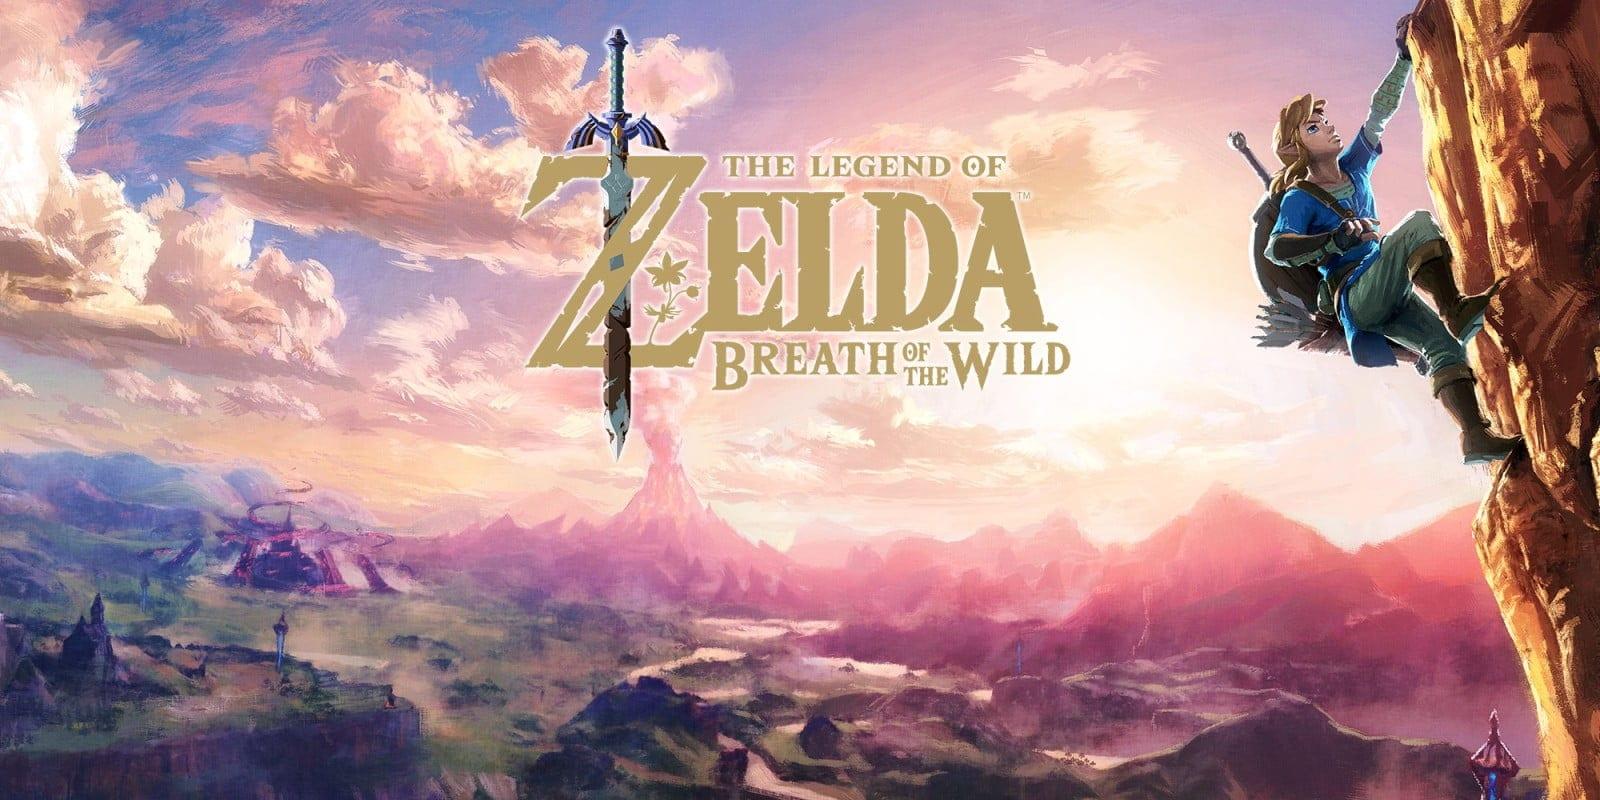 CEMU version 1.15.12 improves the image in The Legend of Zelda: BotW